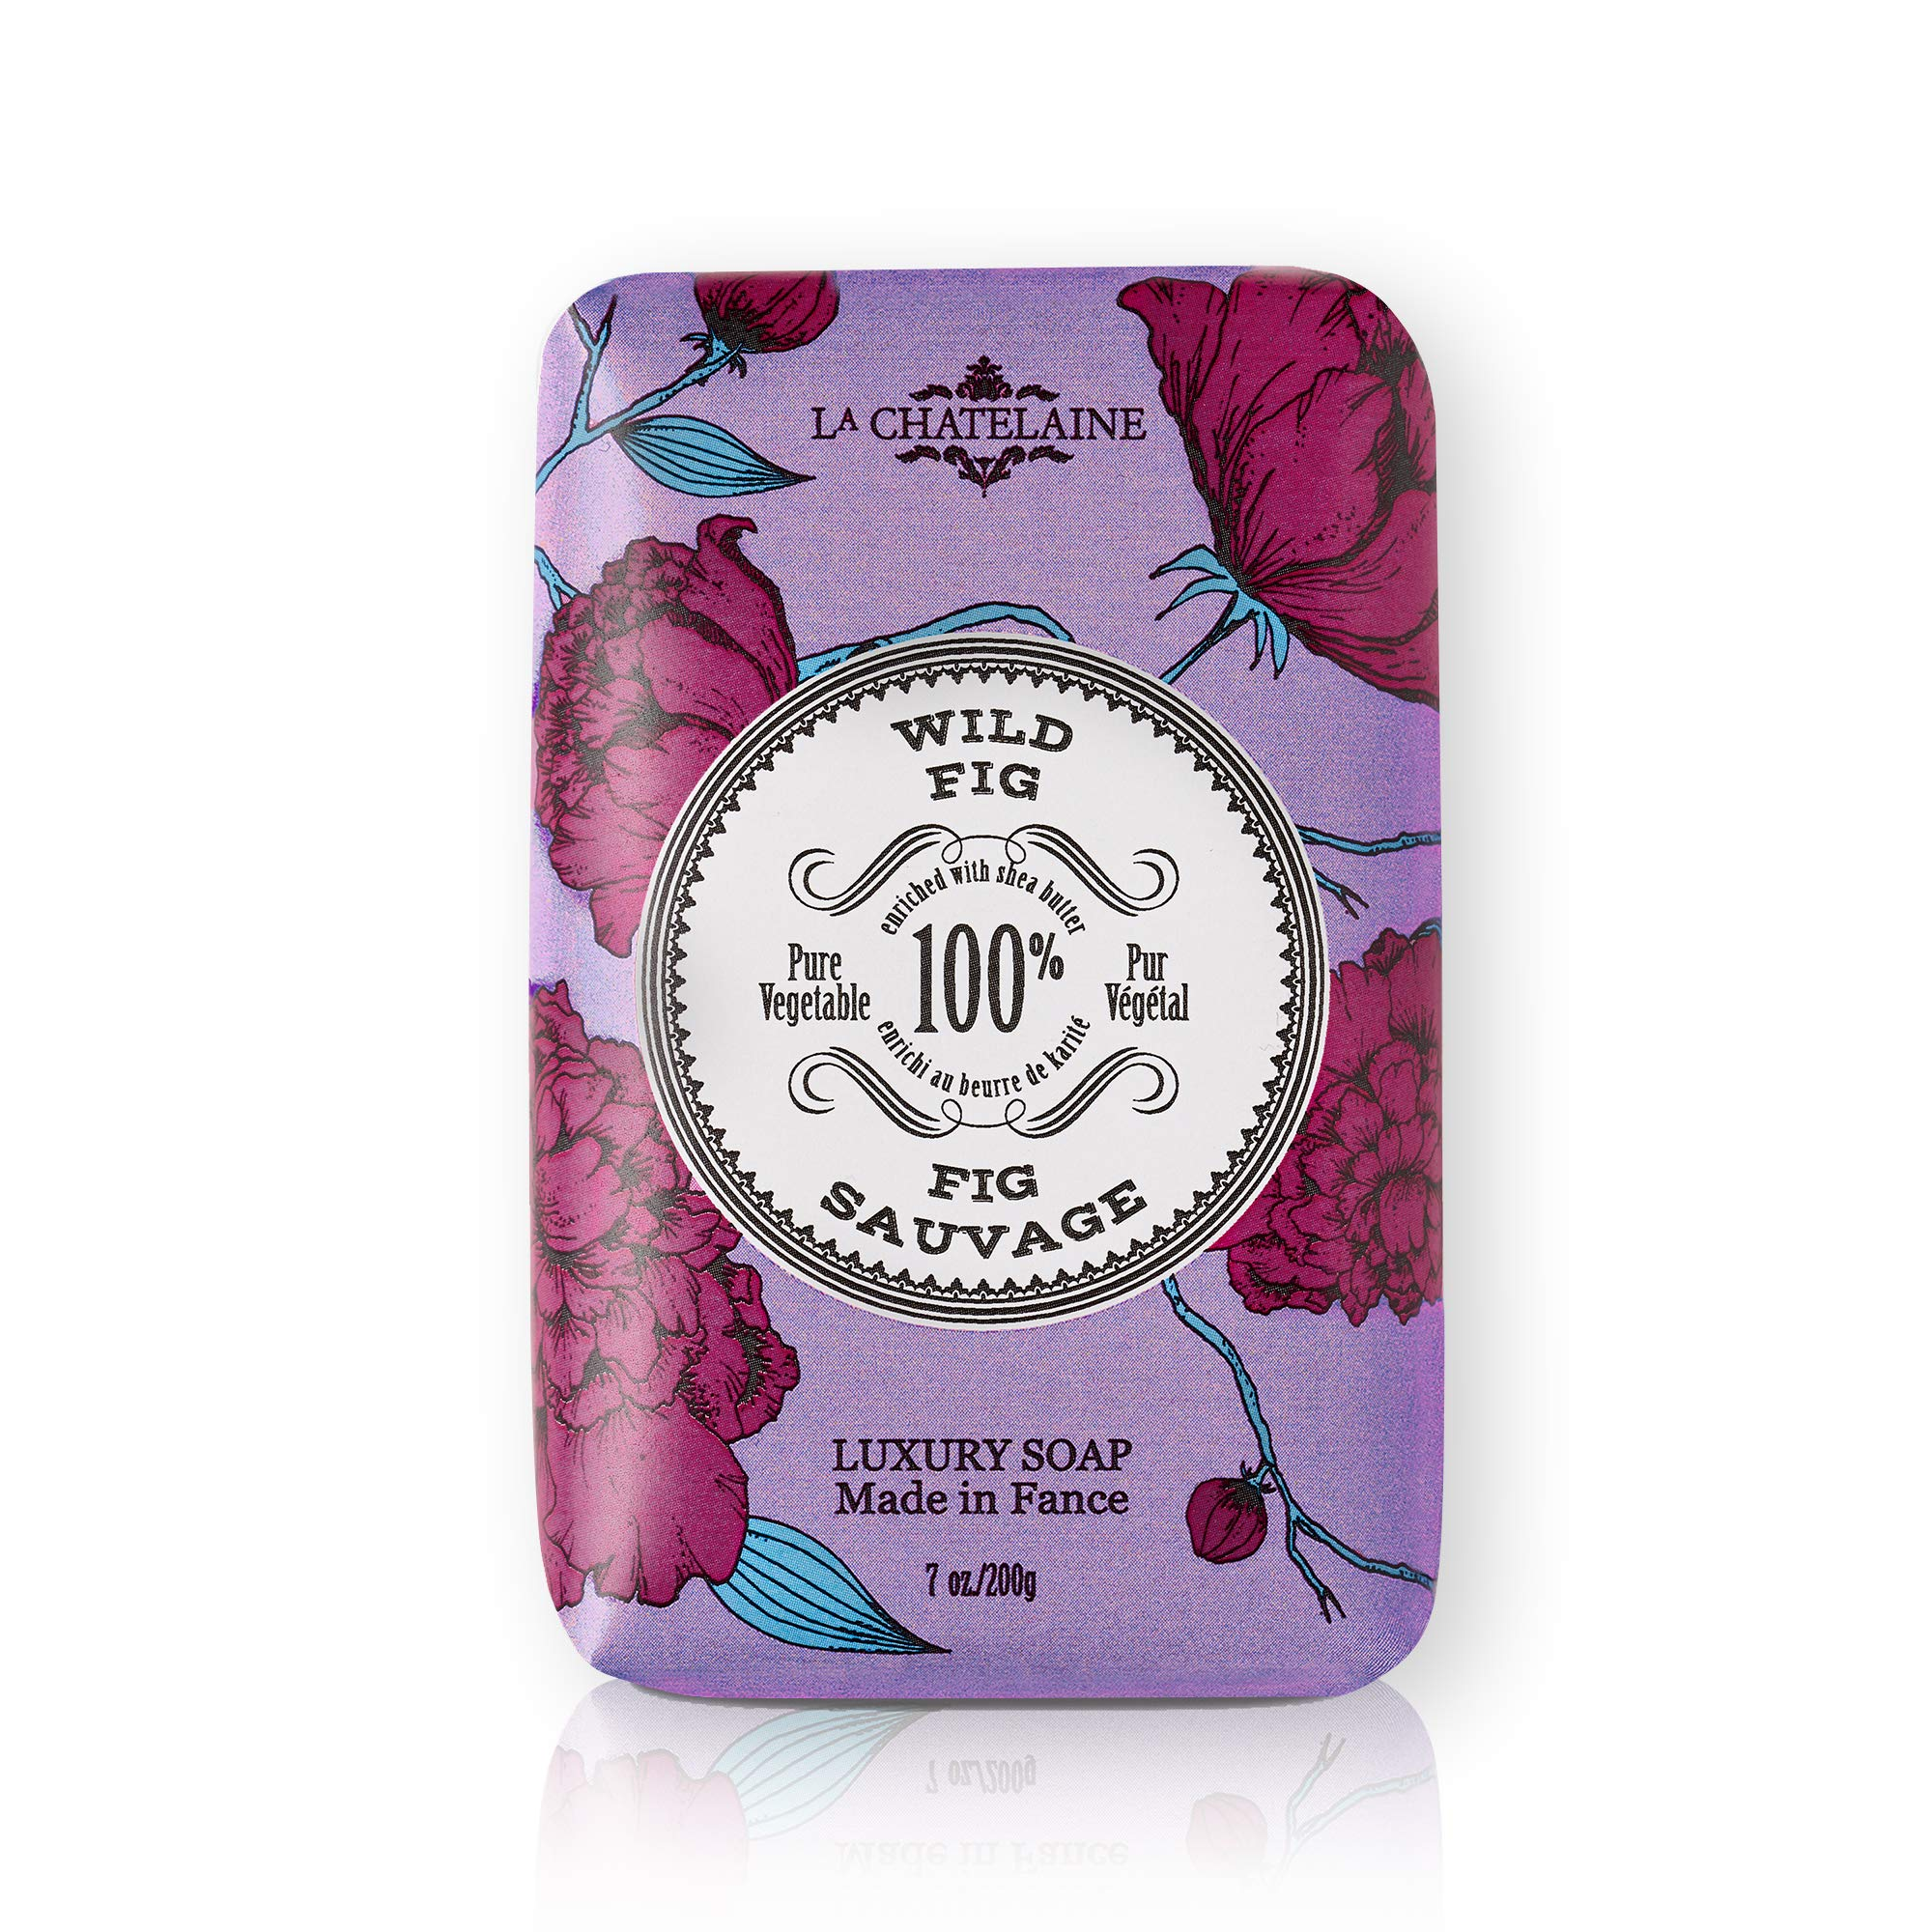 La Chatelaine Luxury Bar Soap   Natural Shea Formula (Wild Fig, 7 oz)